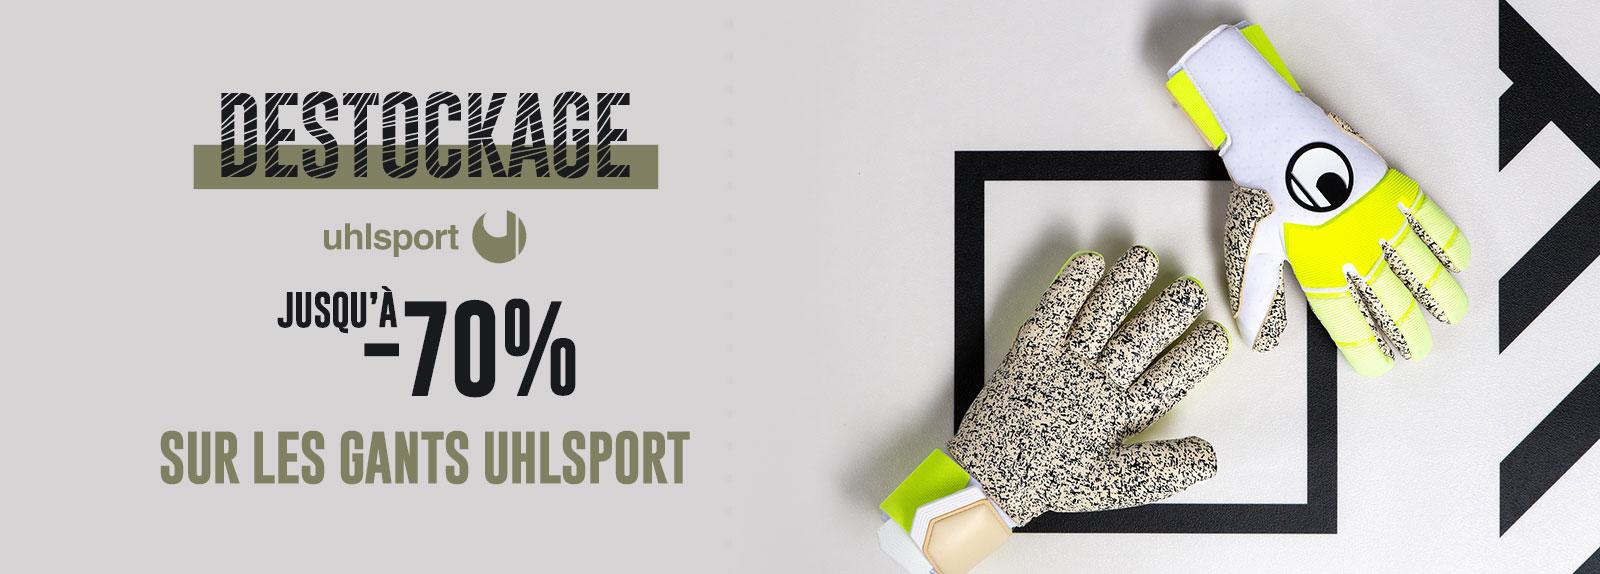 Destockage sur les gants Uhlsport